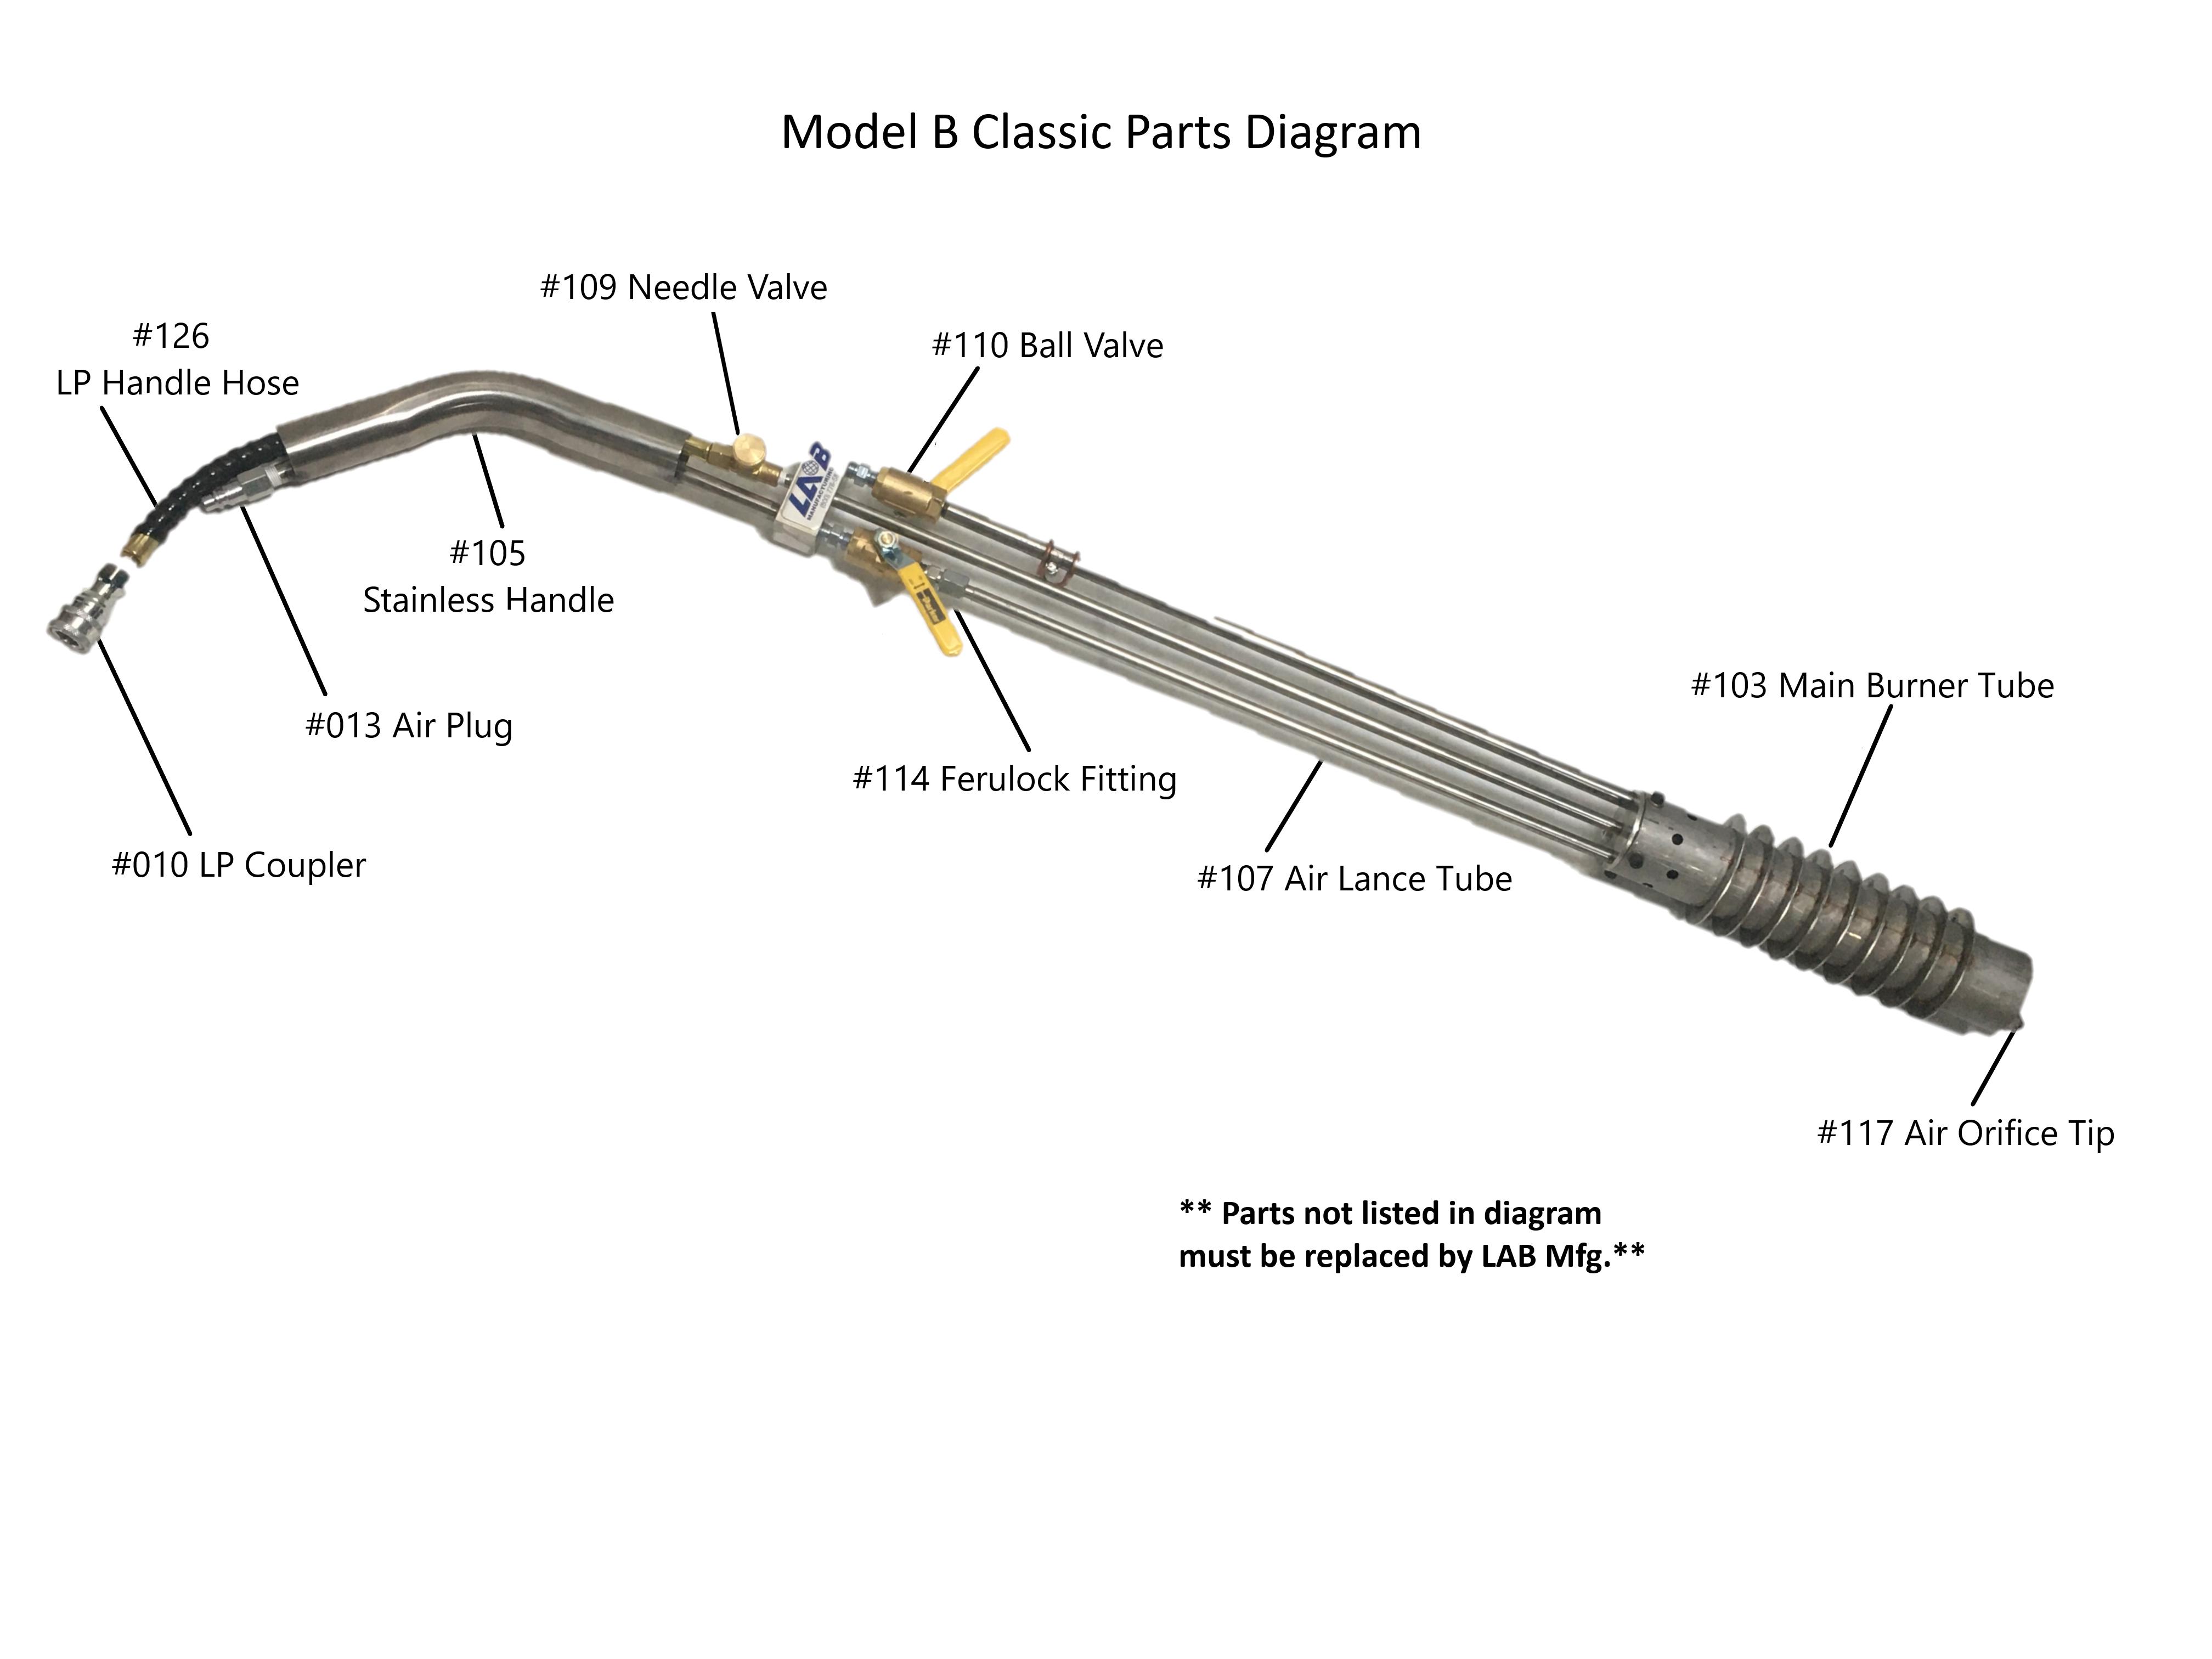 LAB Mod B Parts Diagram